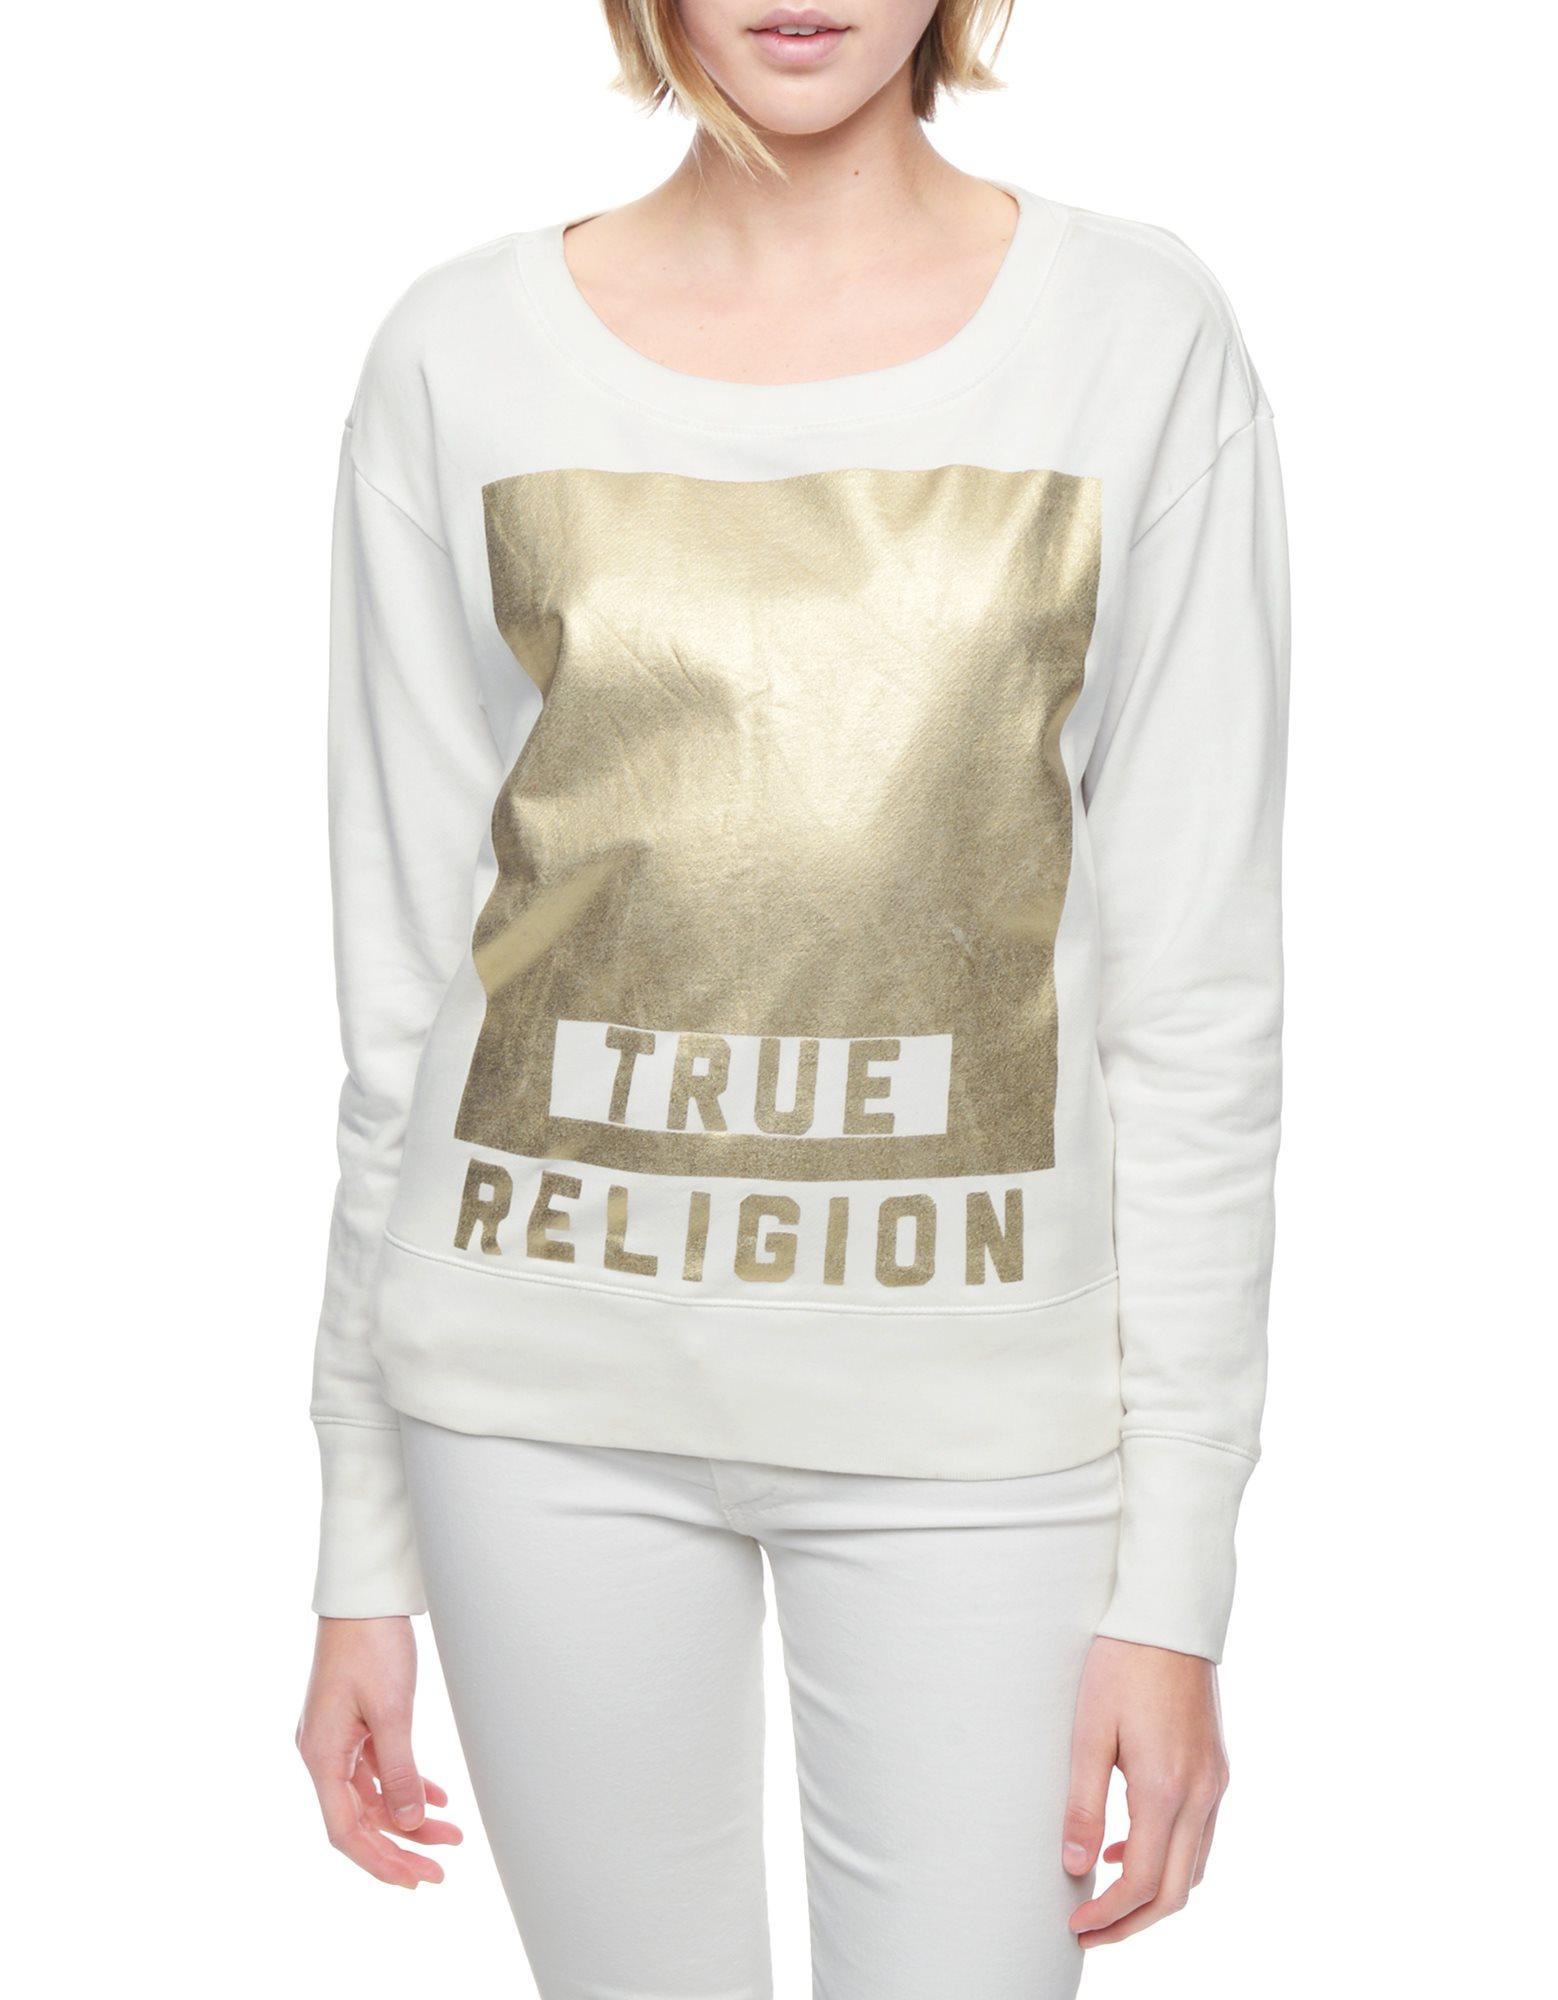 True religion Logo Foil Print Womens Sweatshirt in White ...